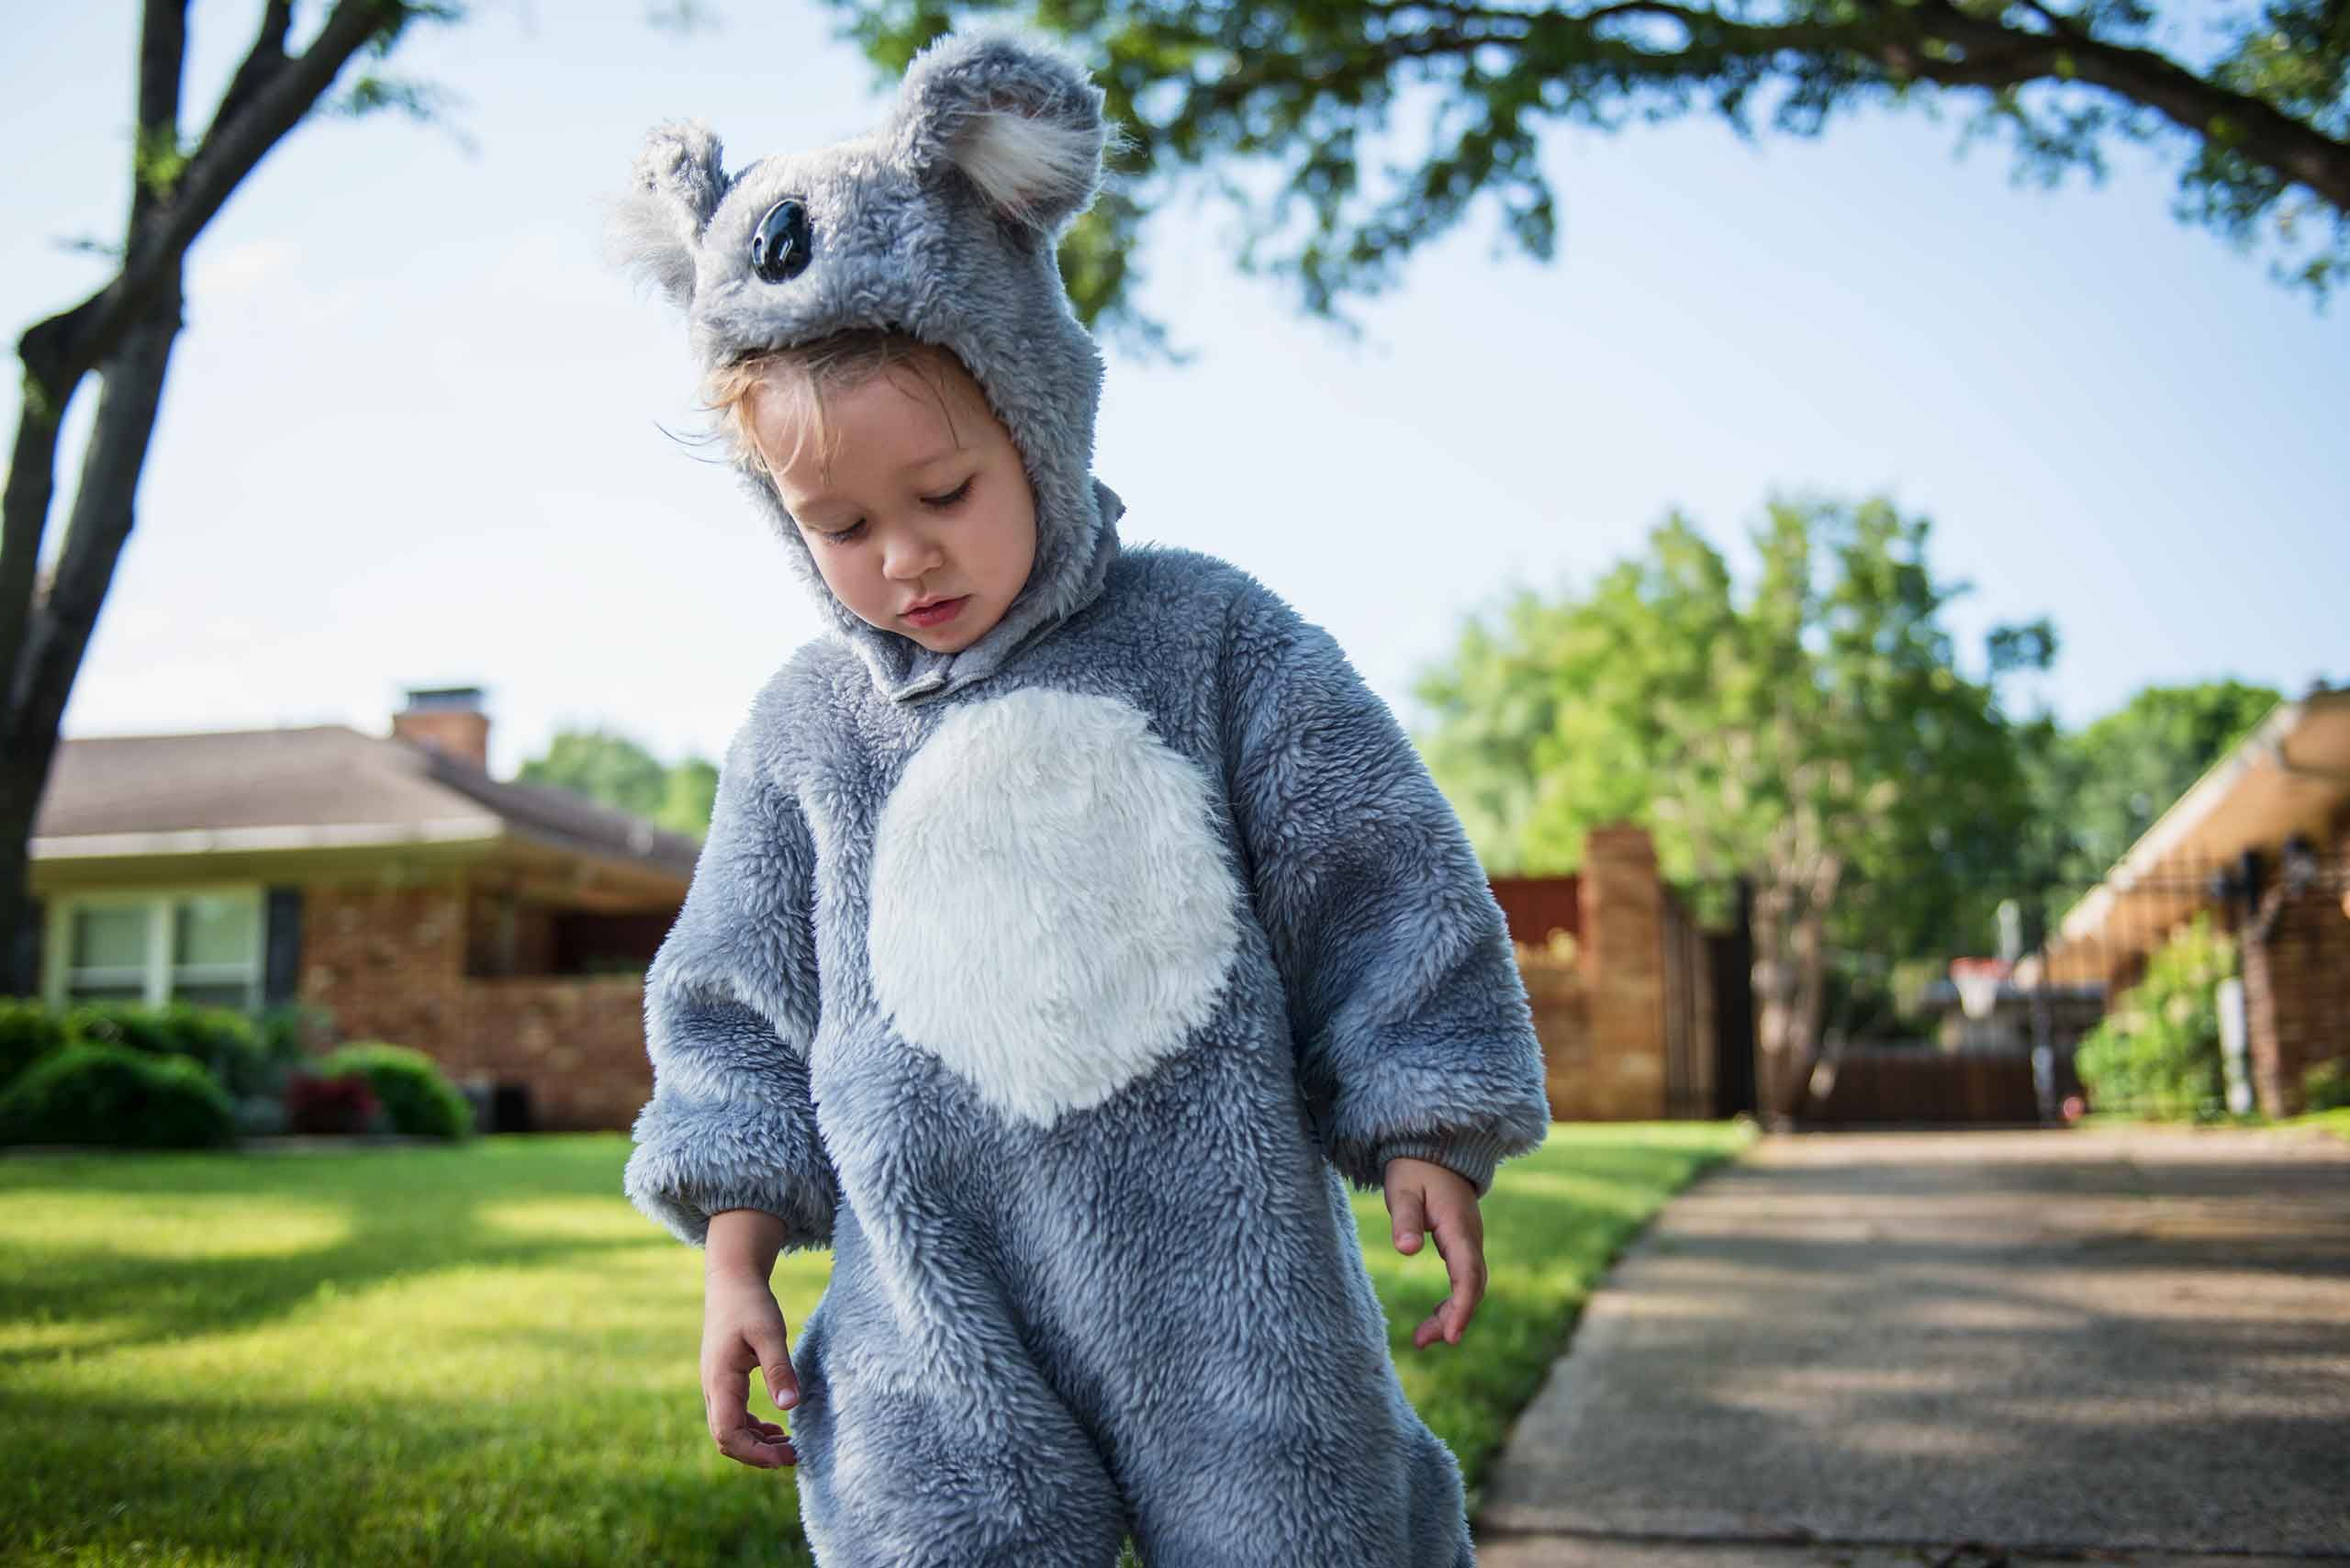 kid-as-koala-in-suburb-by-HenrikOlundPhotography.jpg